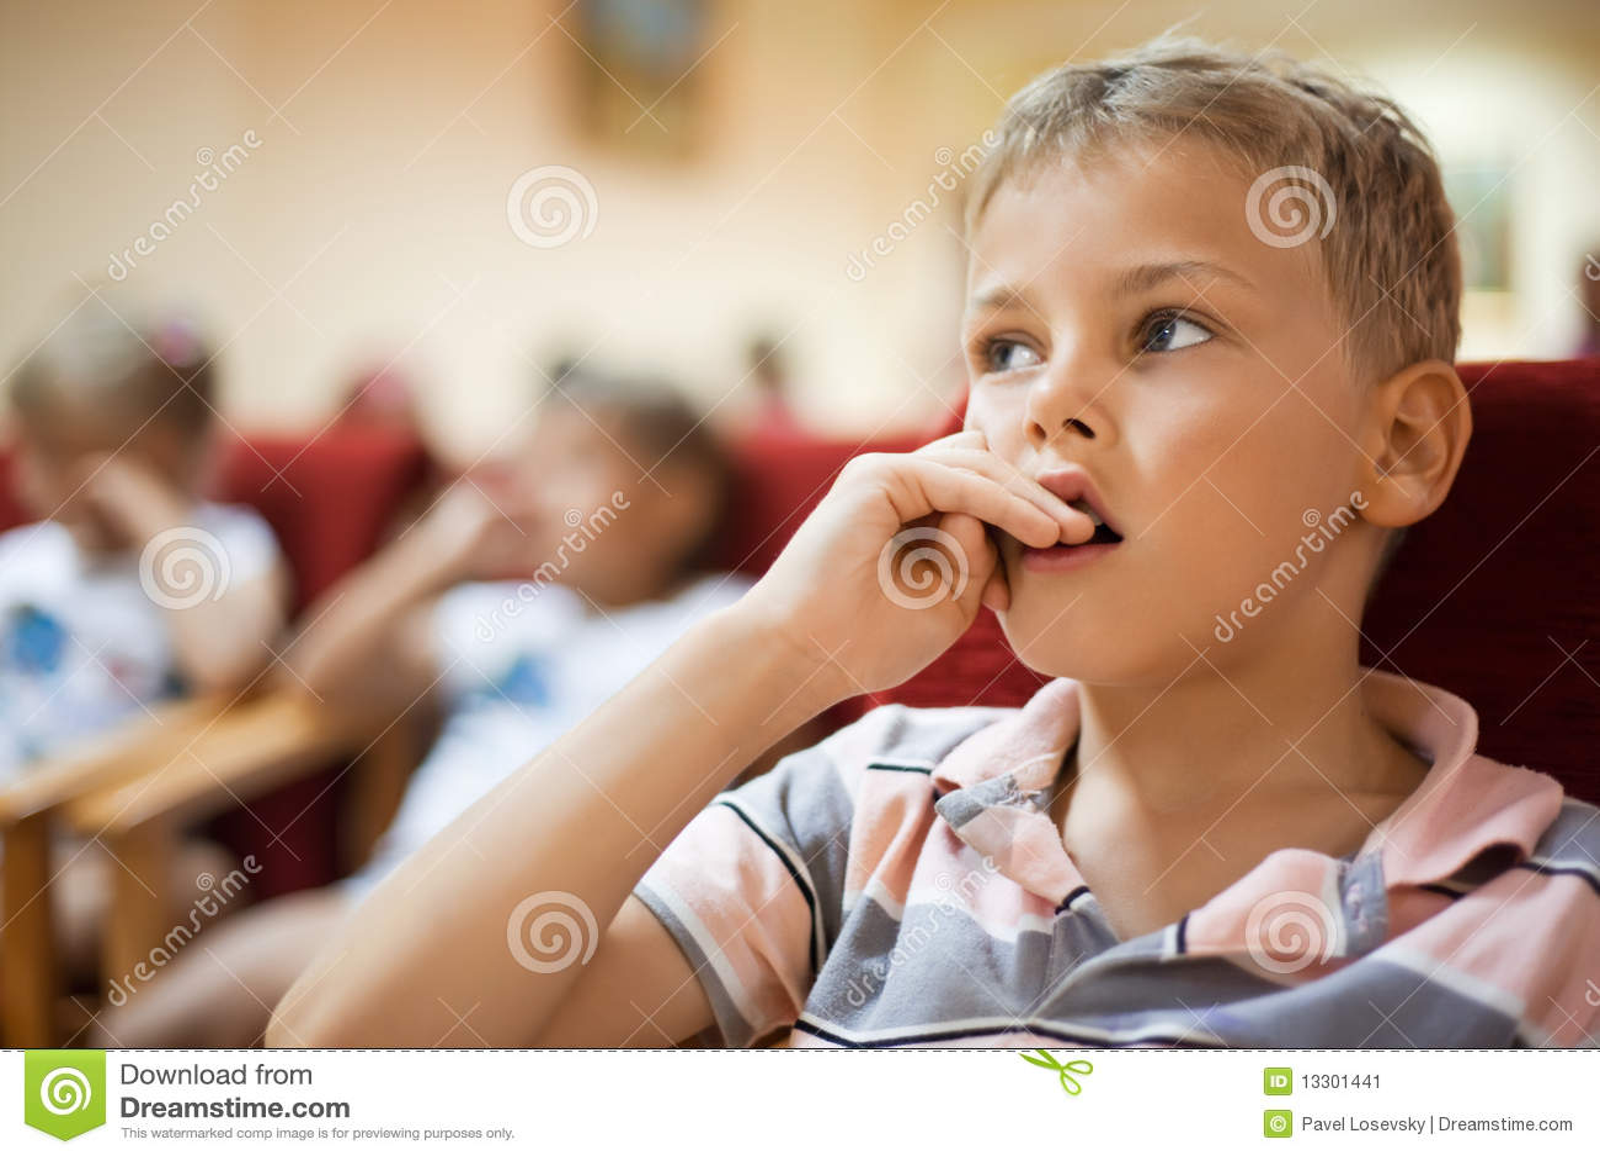 Boy sitting in cinema armchair